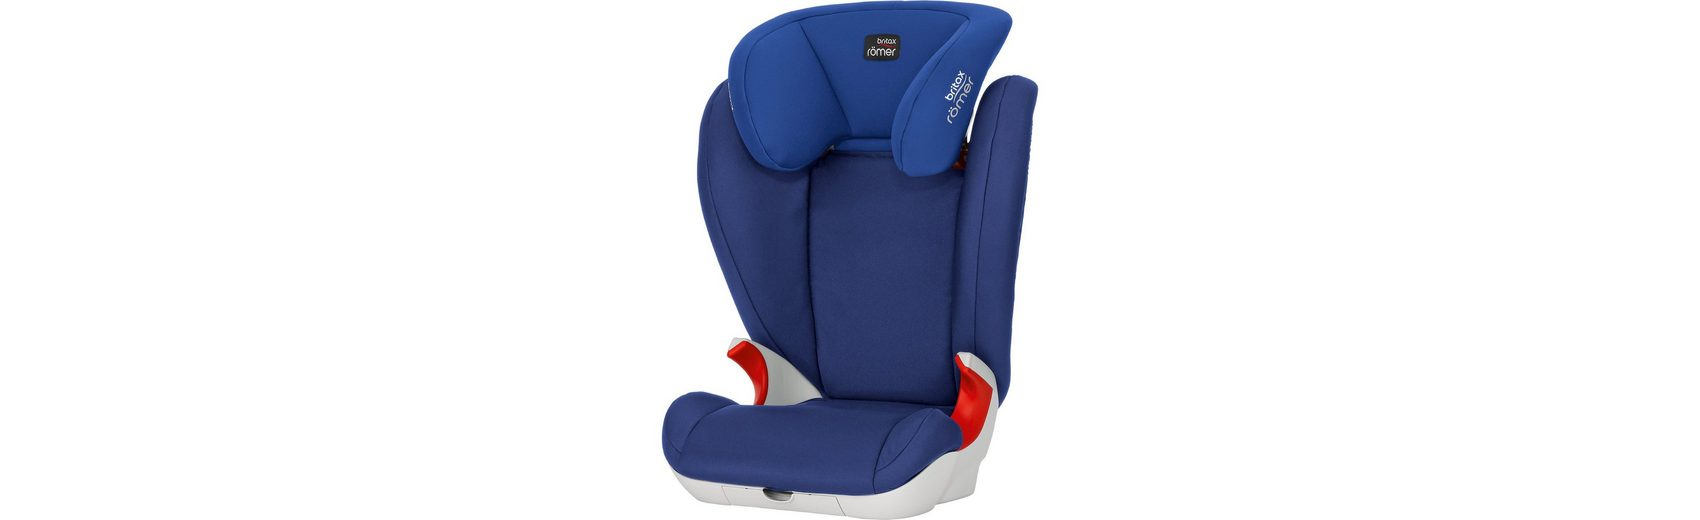 Britax Römer Auto-Kindersitz Kid II, Ocean Blue, 2016